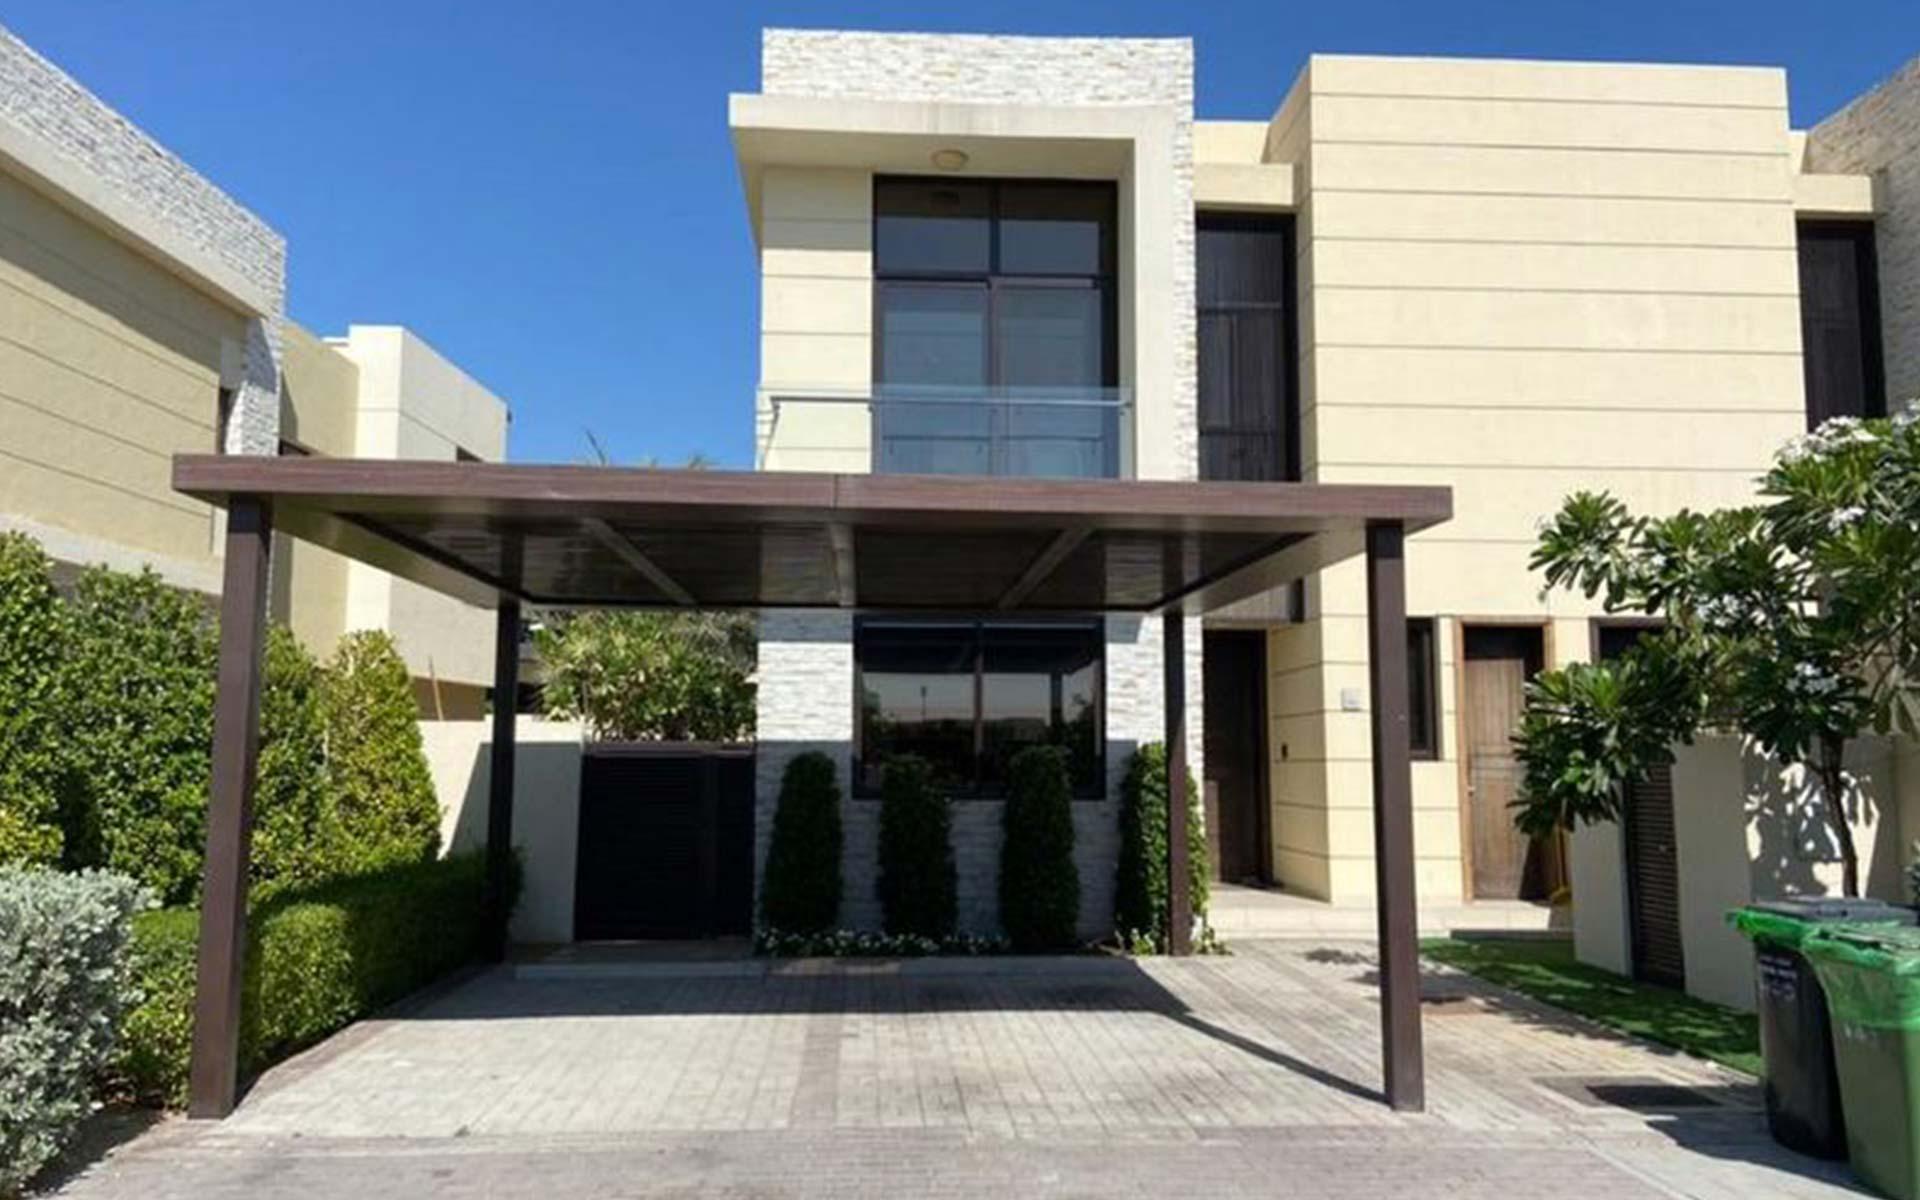 3-bedroom-villa-for-sale-in-longview-at-damac-hills